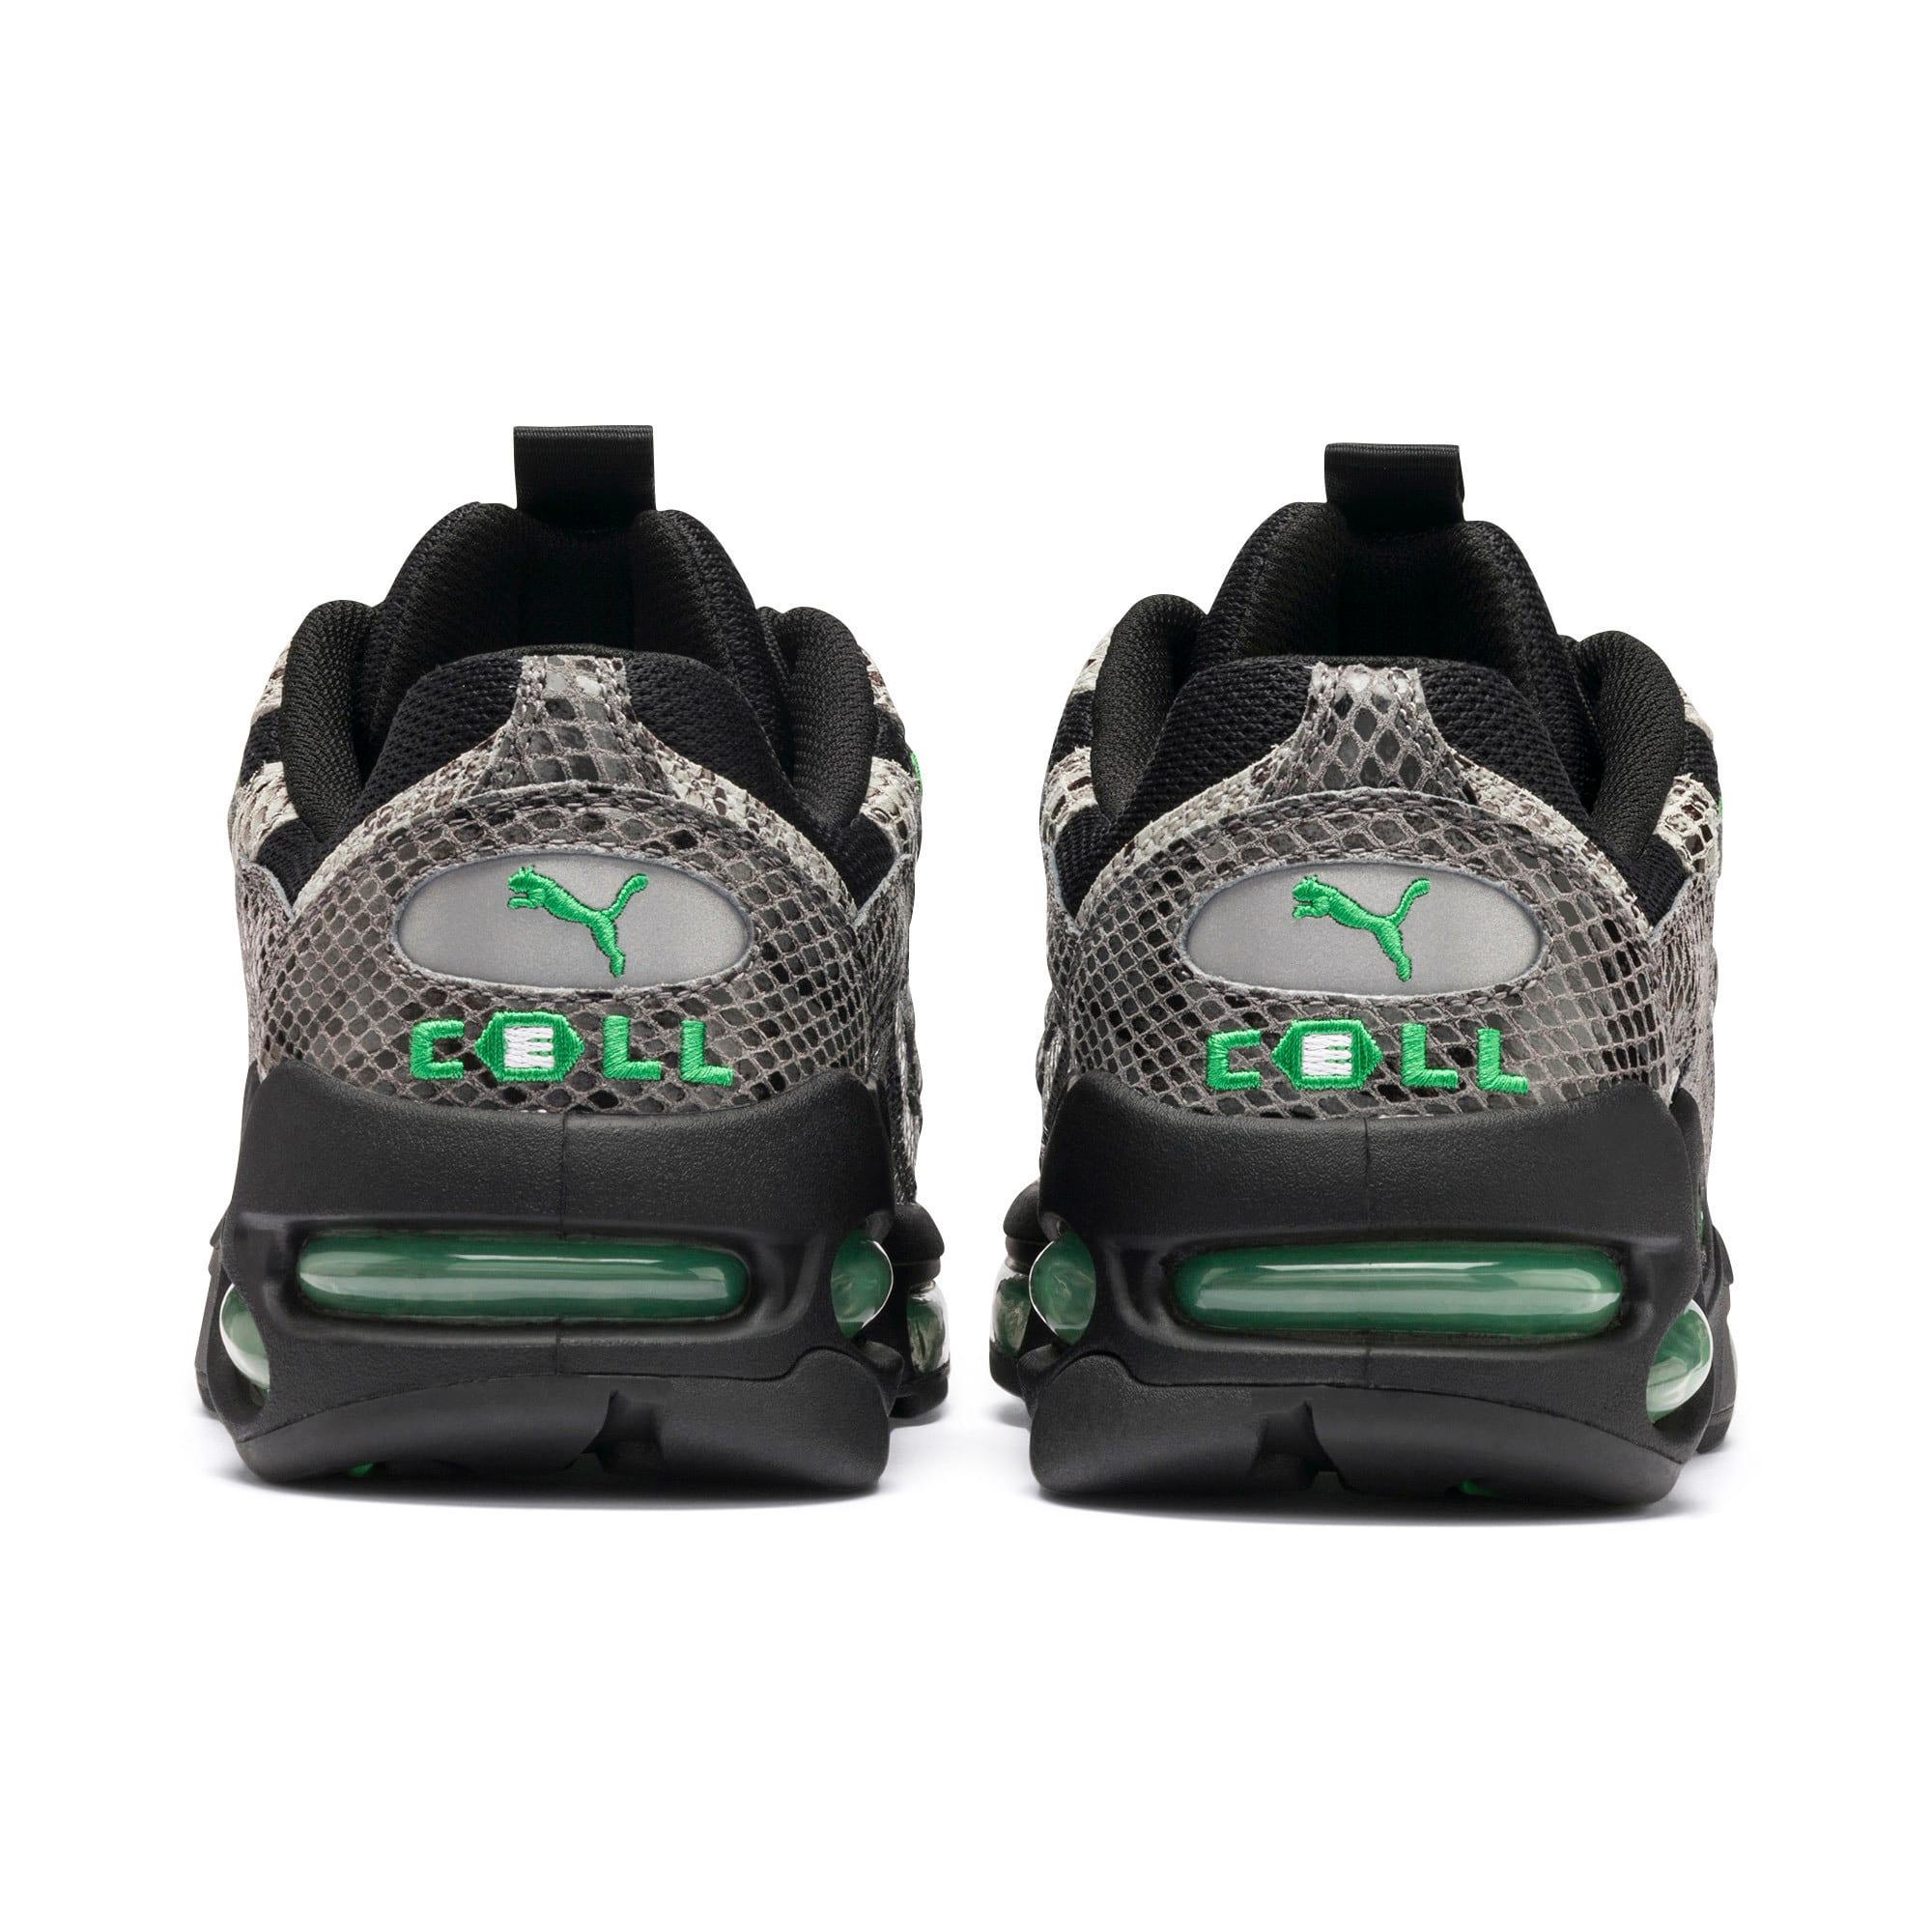 Thumbnail 4 of CELL Endura Animal Kingdom Sneakers, Puma Black-Classic Green, medium